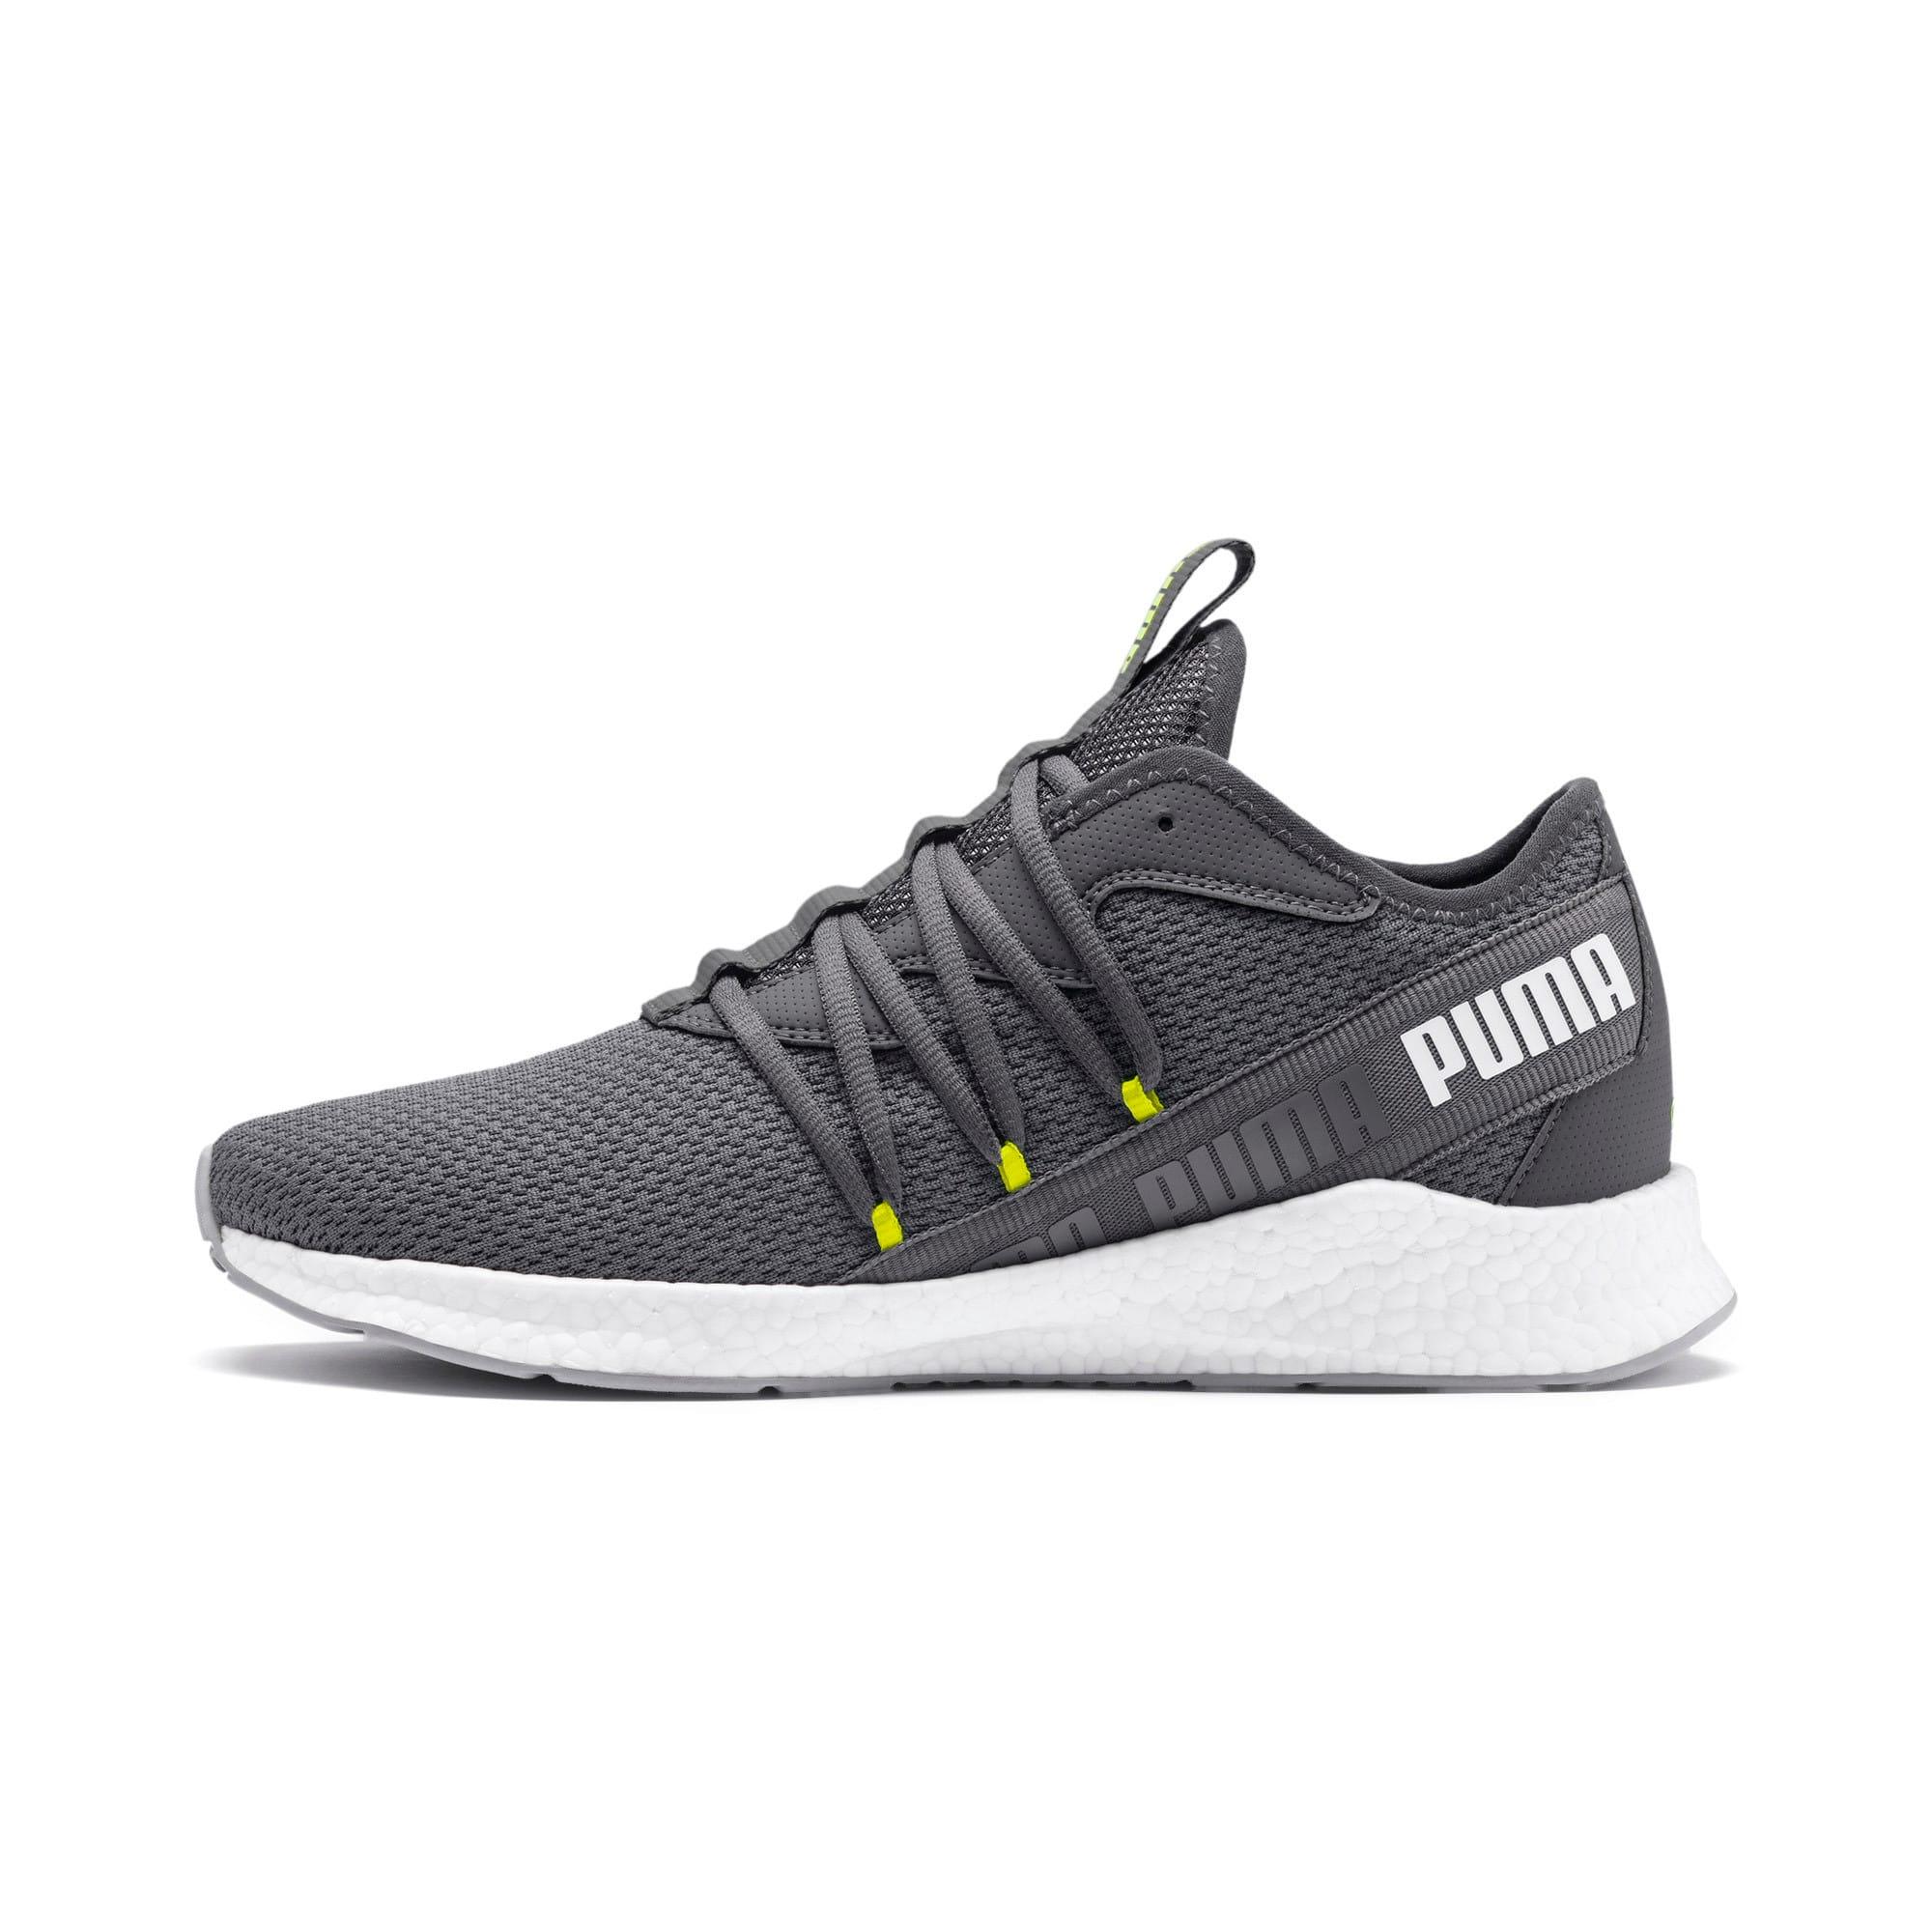 Thumbnail 1 of NRGY Star Running Shoes, CASTLEROCK-White-Yellow, medium